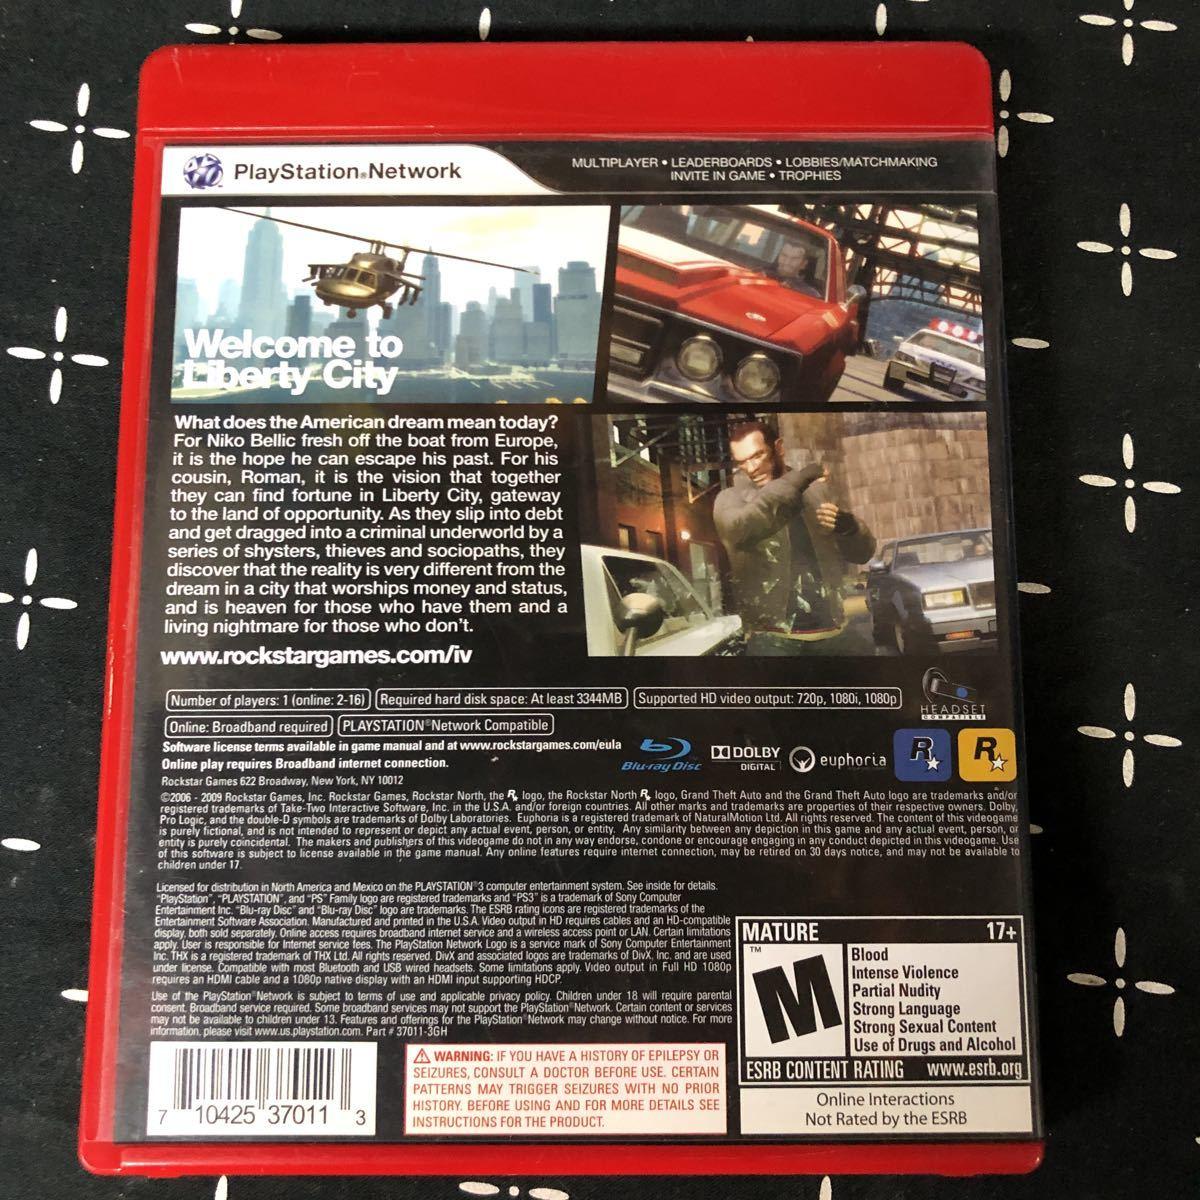 PS3 grand theft auto IV(北米版) プレイステーション3 グランドセフトオート GTA4 海外版 Rockstar R☆